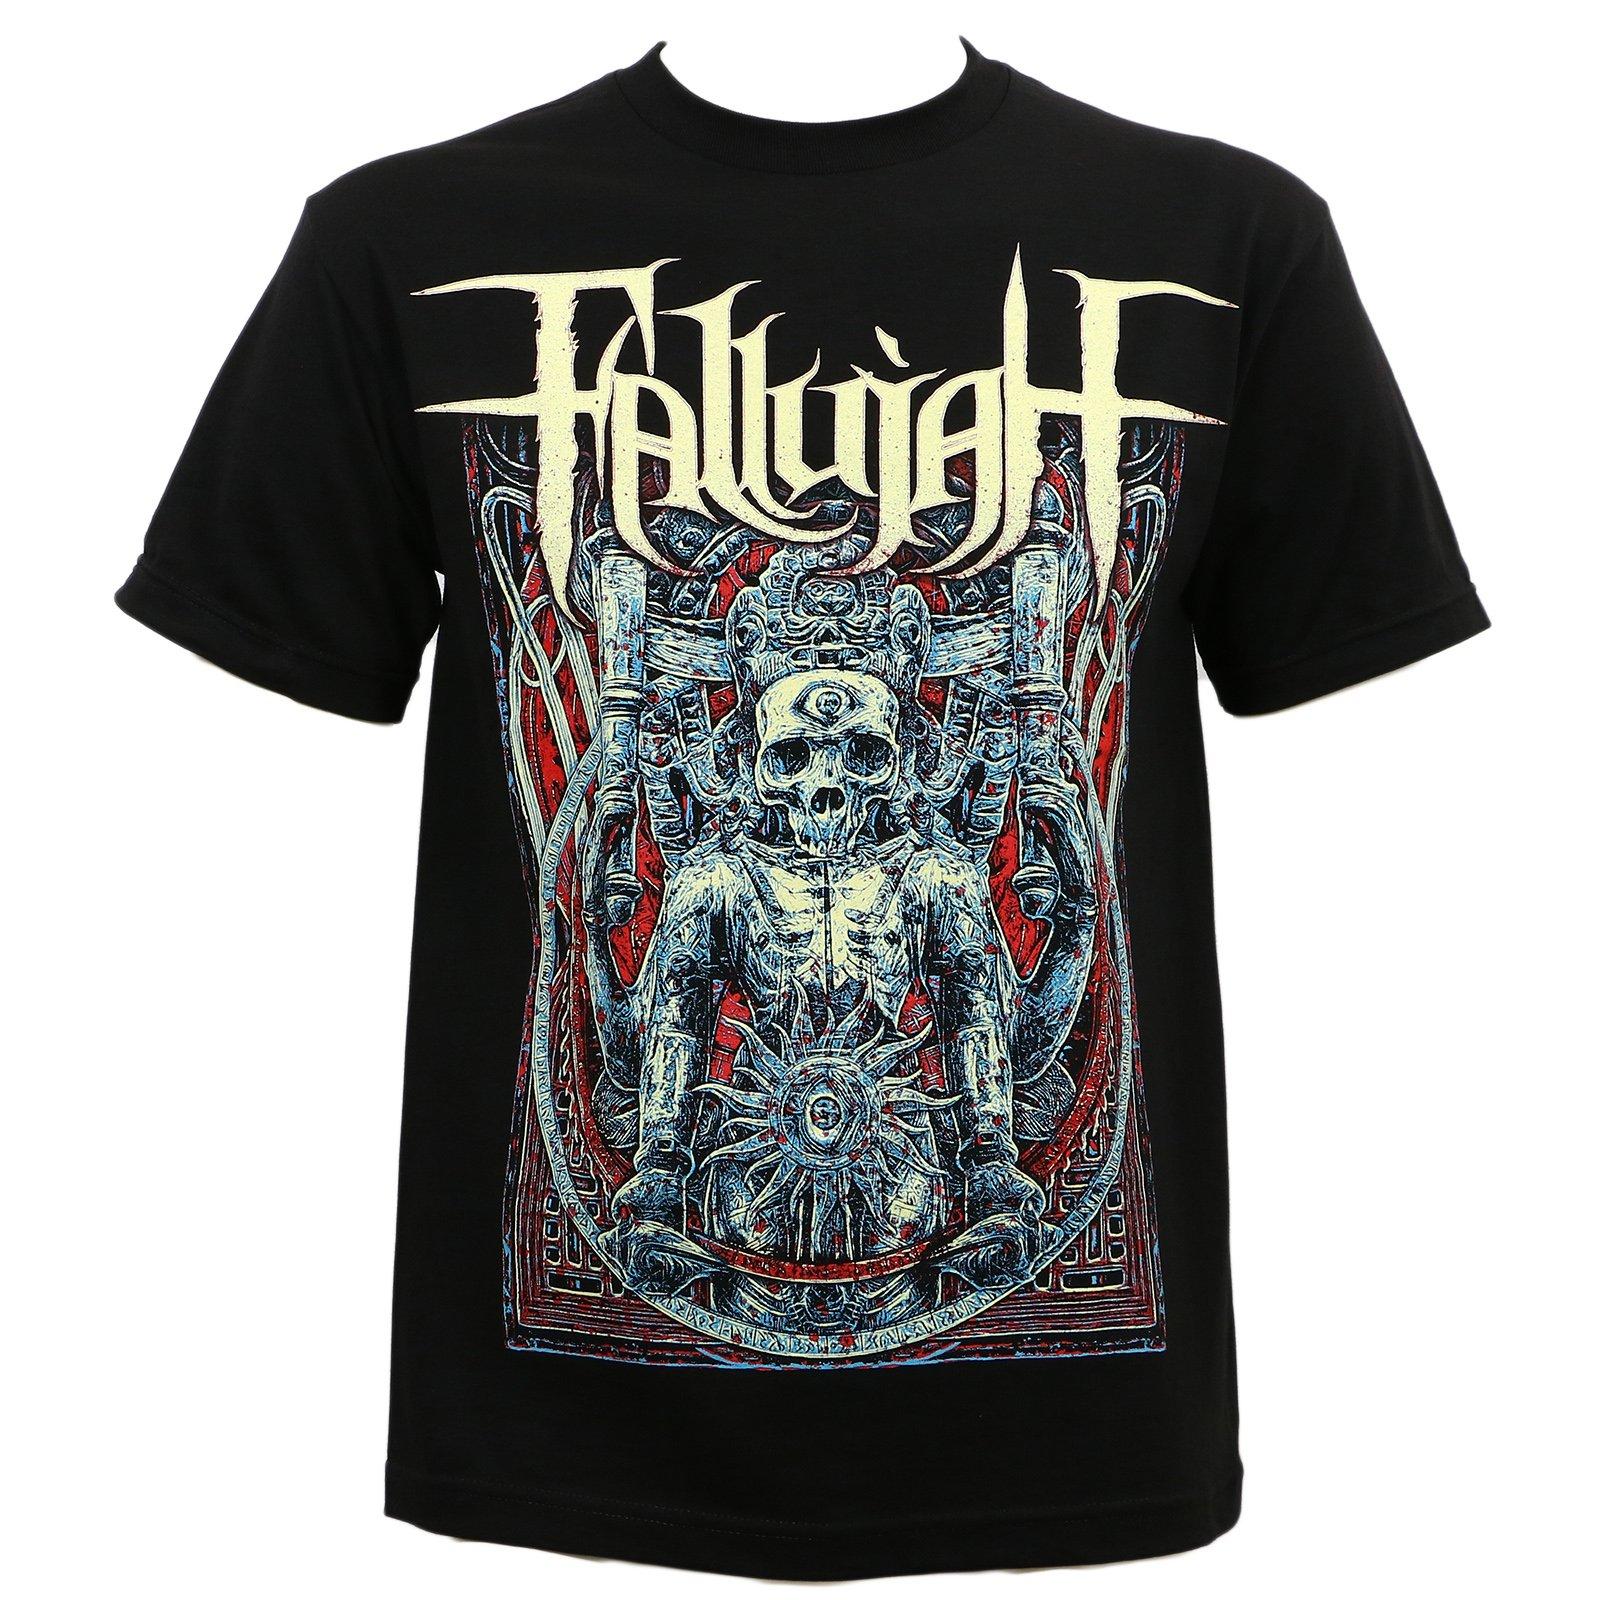 Indie Merch Fallujah S Demise Tshirt Black